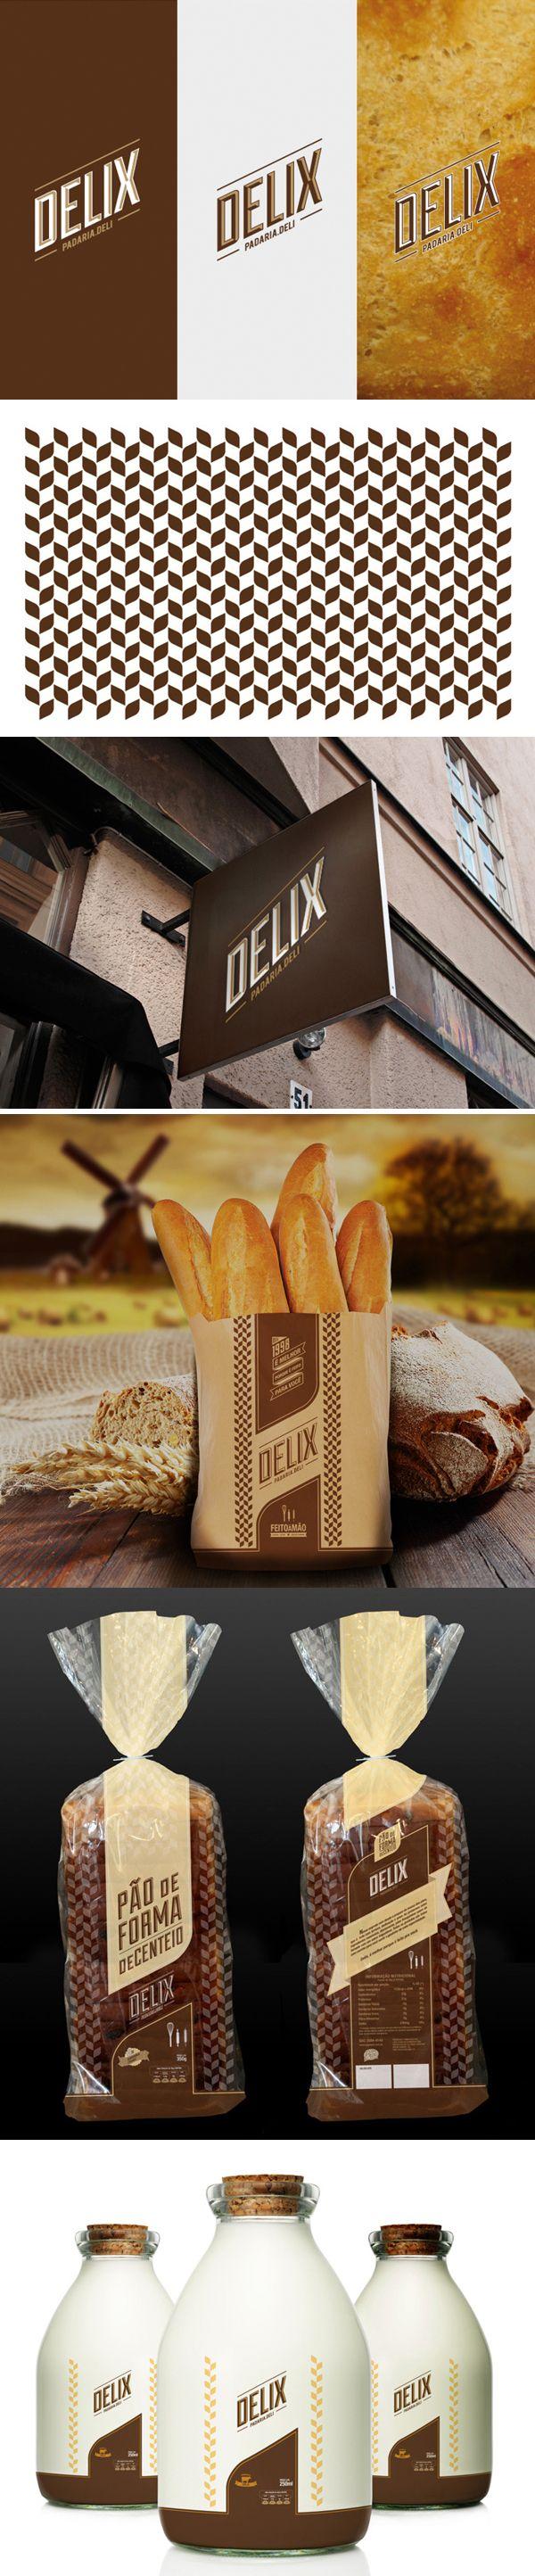 U / delix bakery | #stationary #corporate #design #corporatedesign #identity #branding #marketing < repinned by www.BlickeDeeler.de | Take a look at www.LogoGestaltung-Hamburg.de